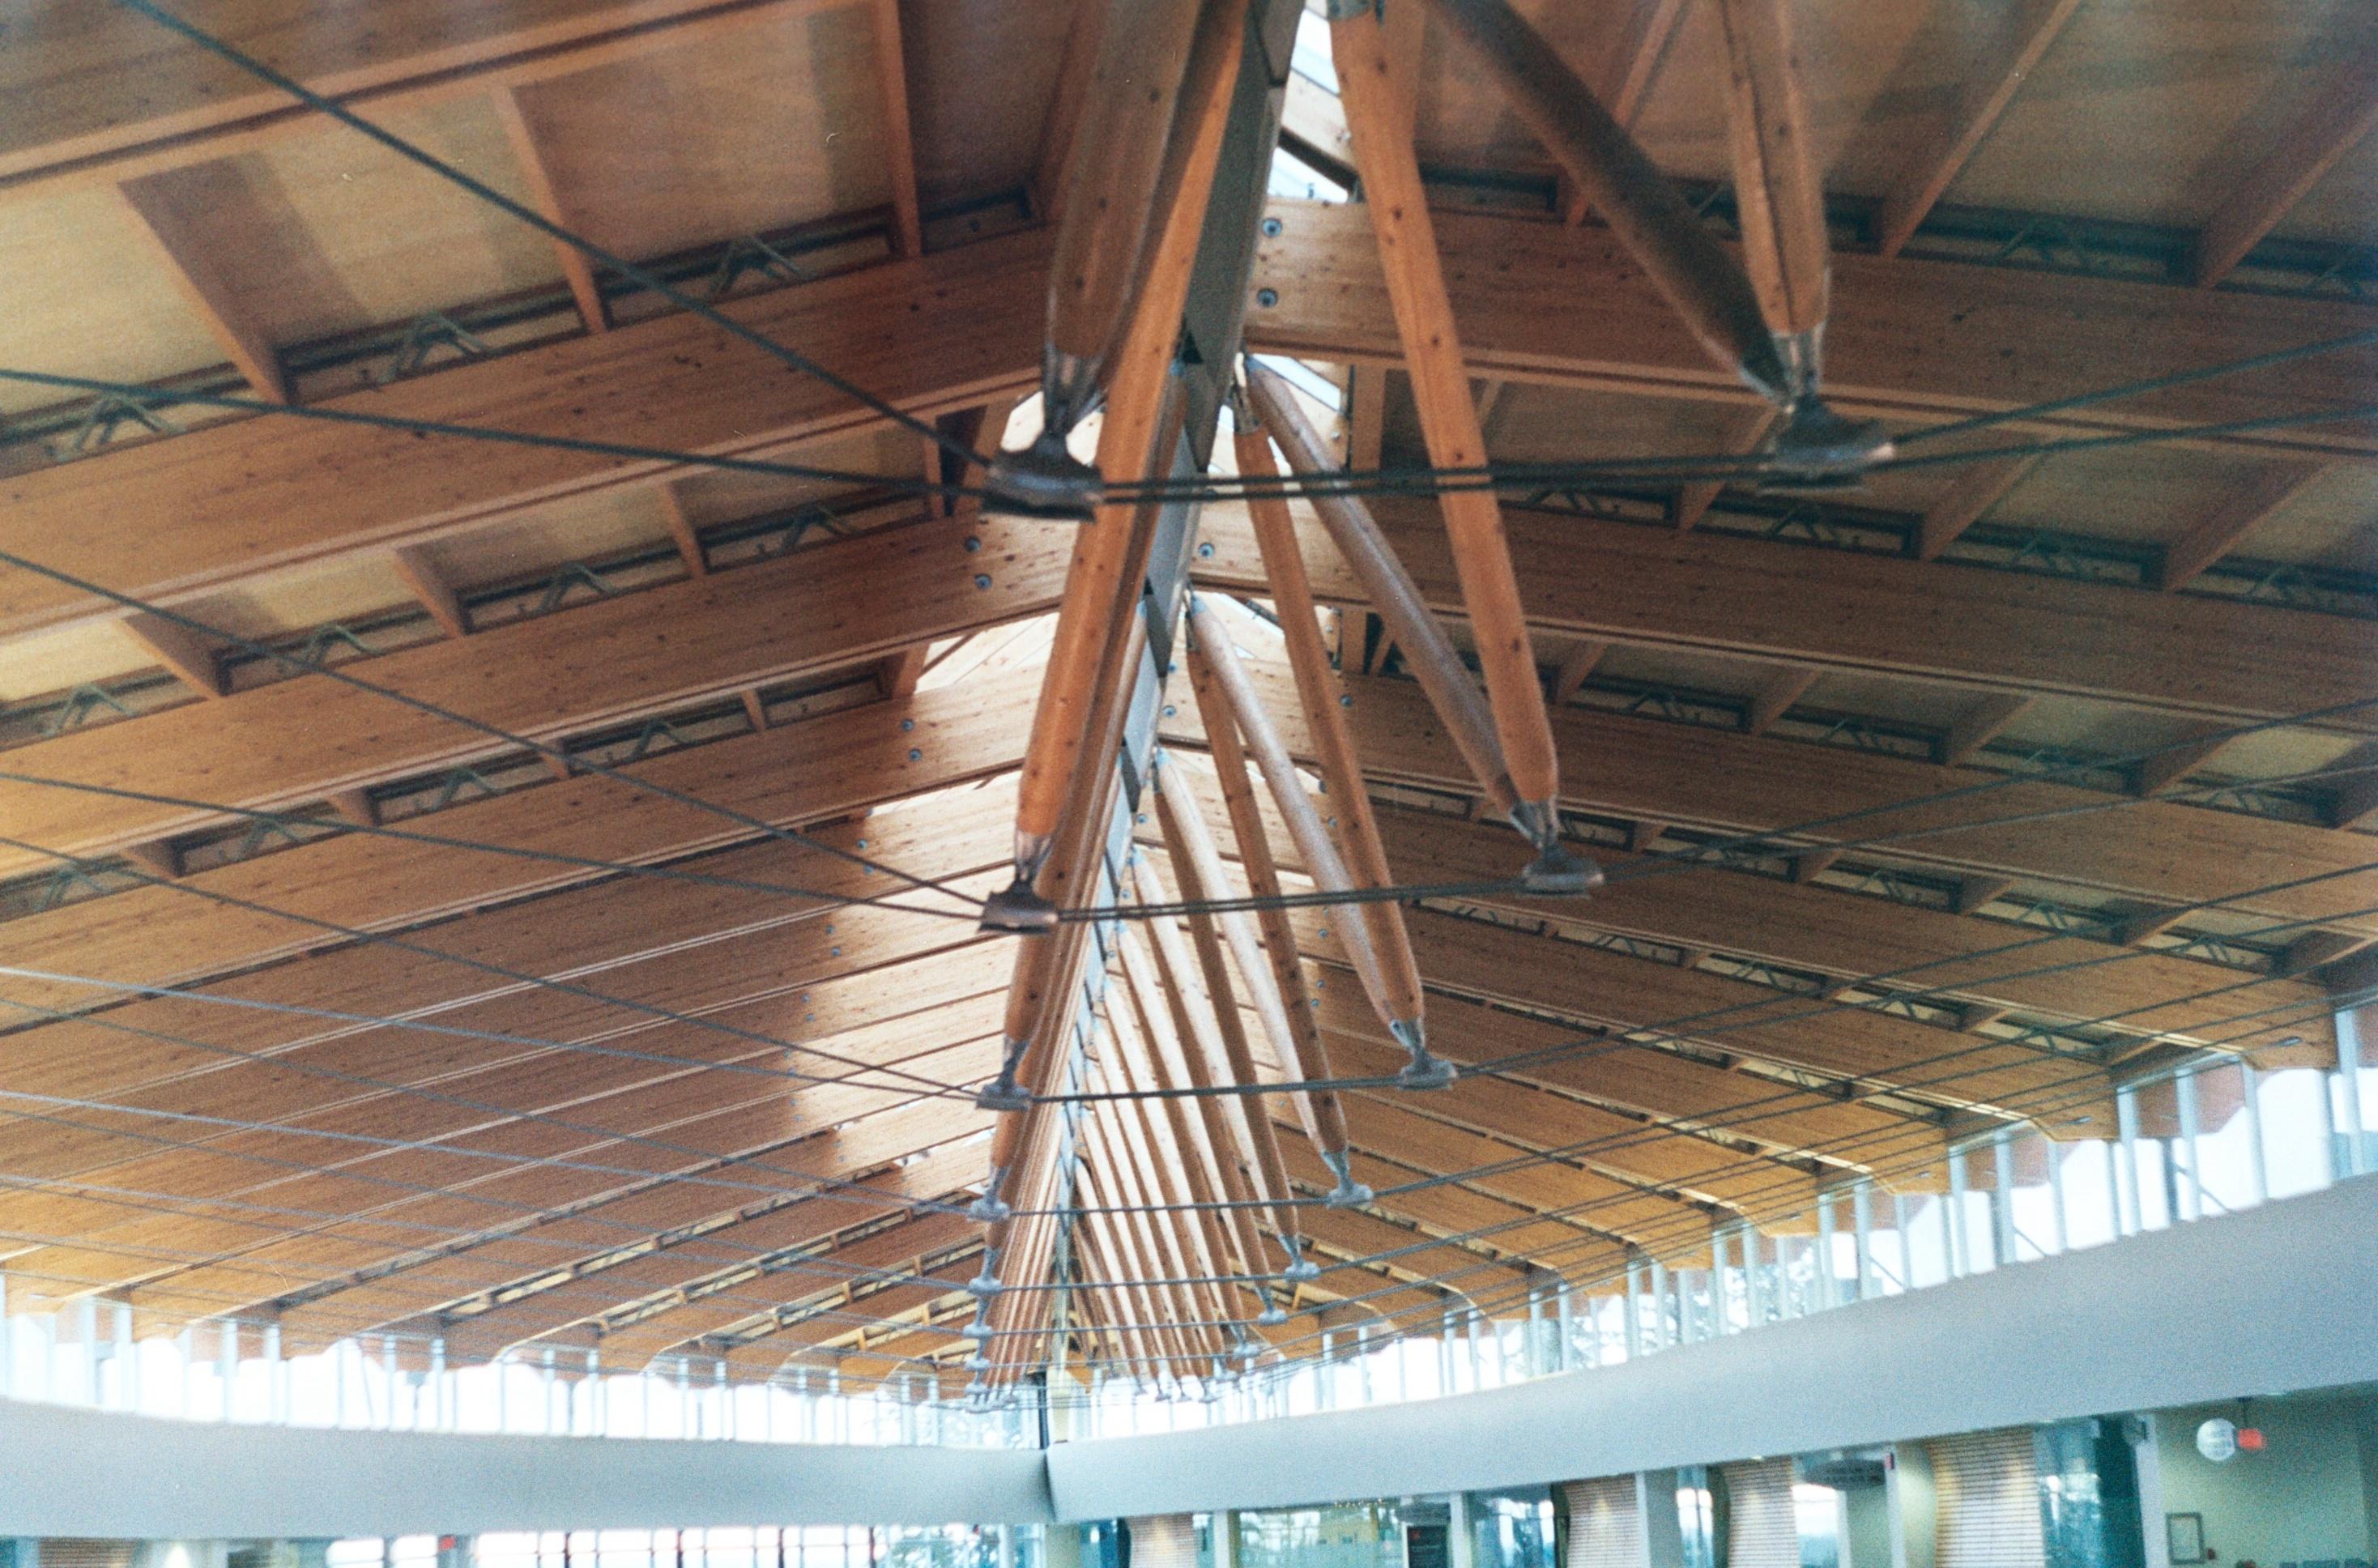 Wood Floor Roof Film Ship Beam Ceiling Interior Design Handrail Stairs Beams Hull Manual Ussr Helios442